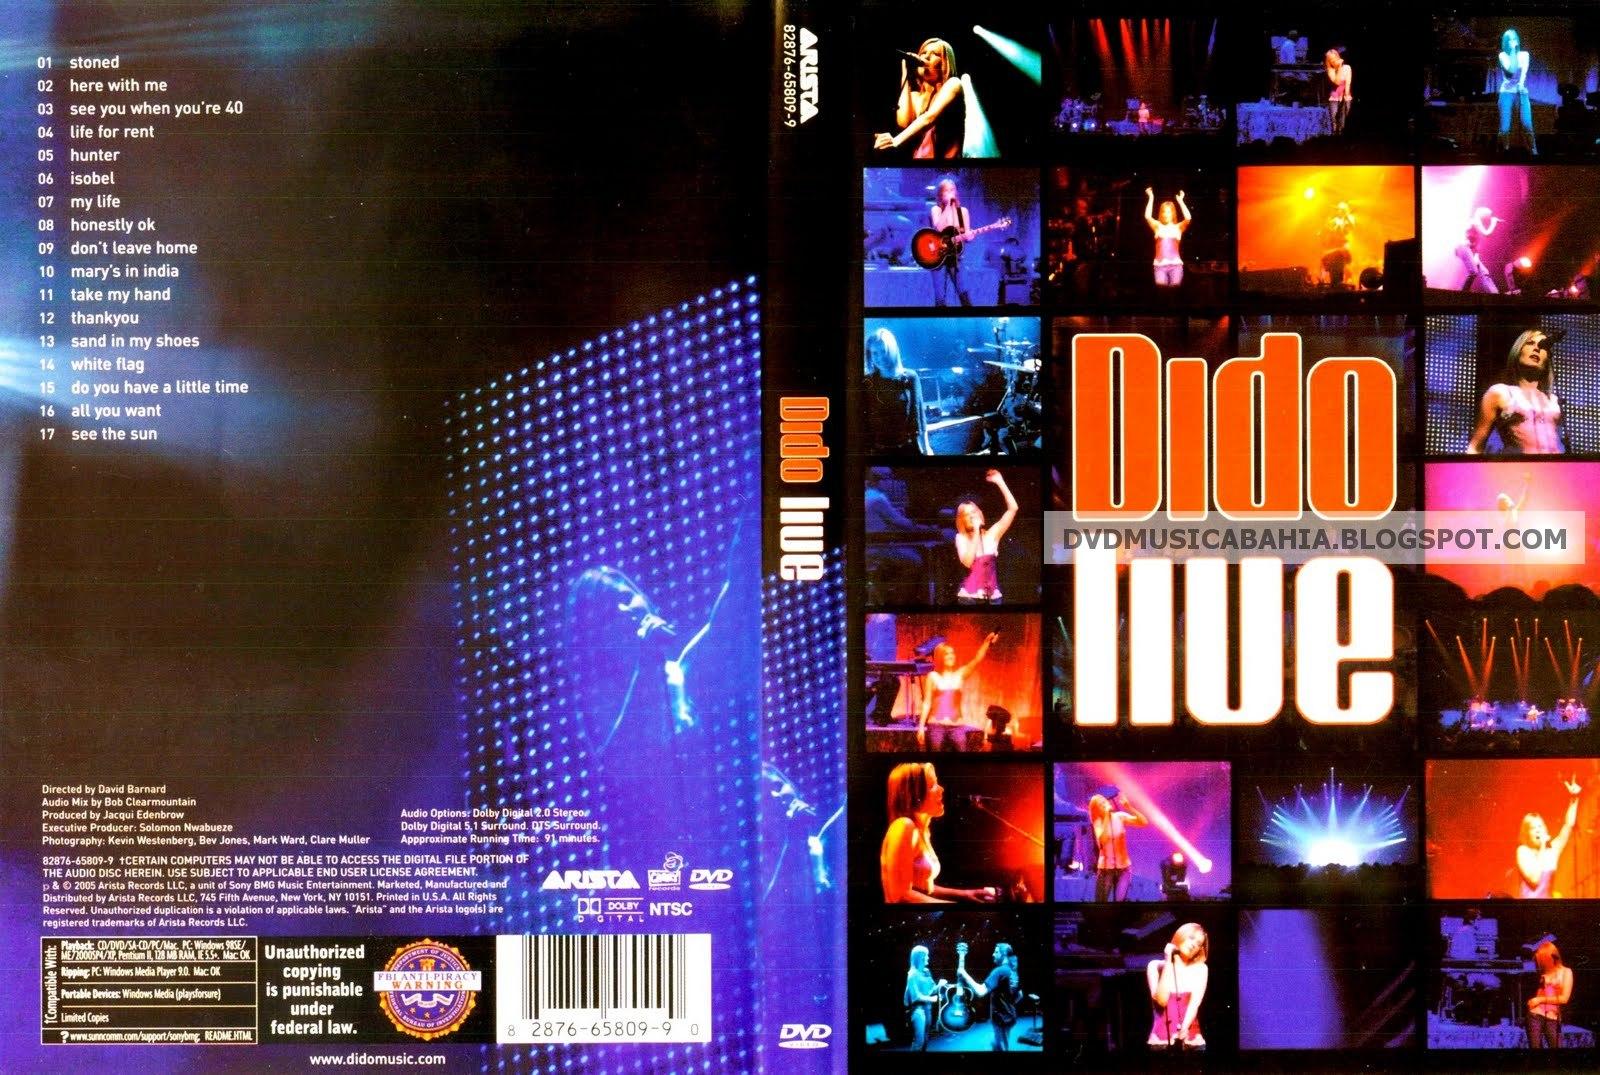 http://2.bp.blogspot.com/_PiUVny6RPwY/TKX8aPza4kI/AAAAAAAABME/bJ0SiUeZjpY/s1600/0887+-+Dido+-+Live+at+Brixton+Academy.jpg